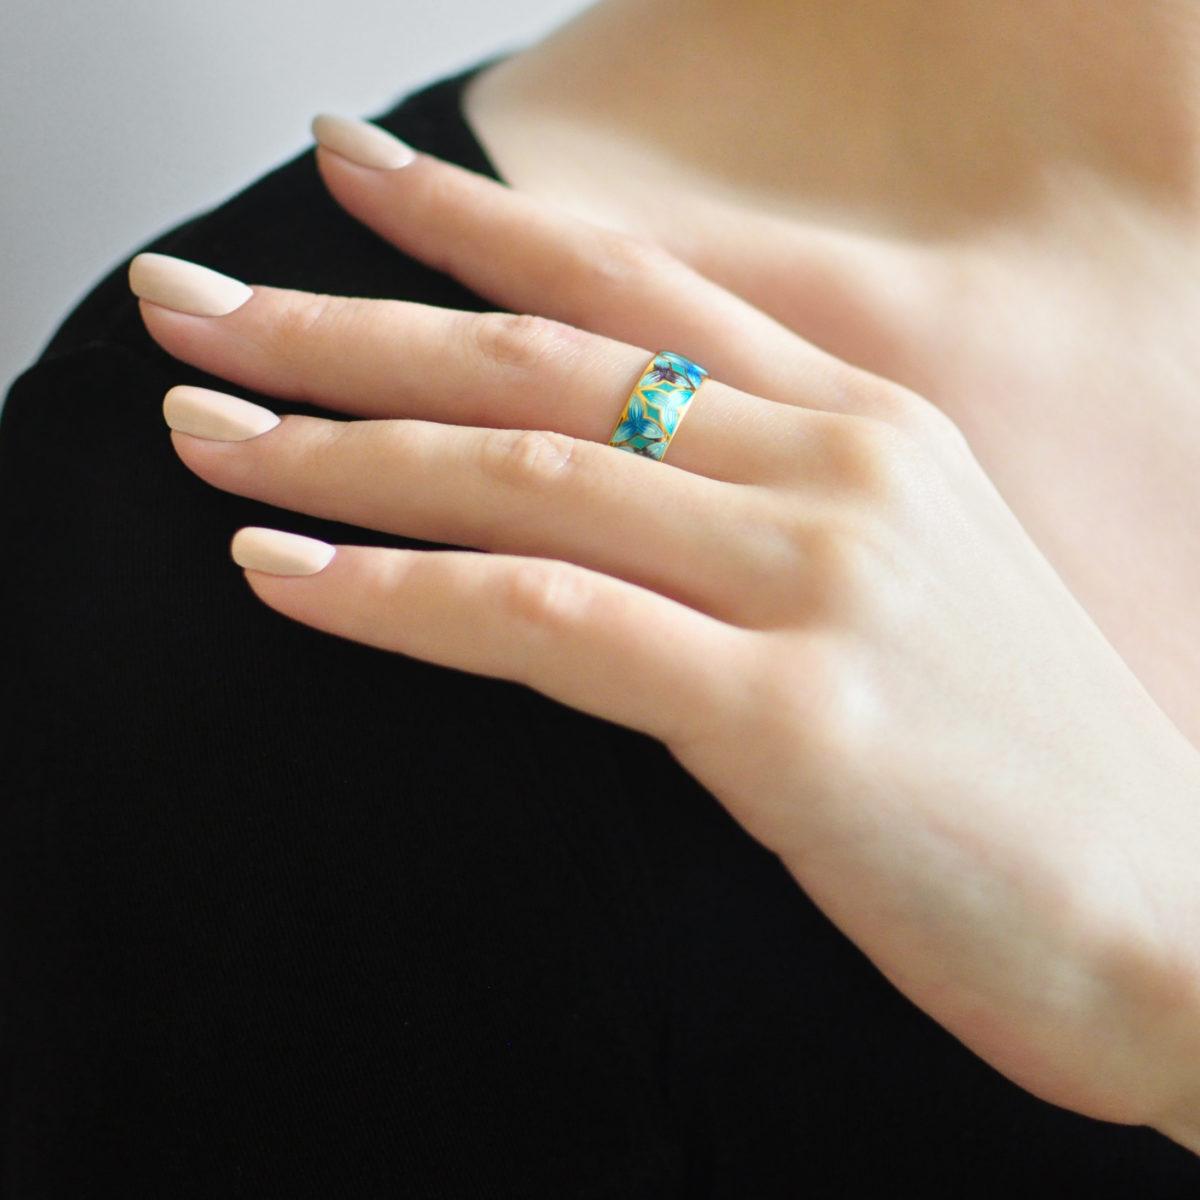 Zolochenie golubaya 12 1200x1200 - Кольцо из серебра «Трилистник» (золочение), голубое